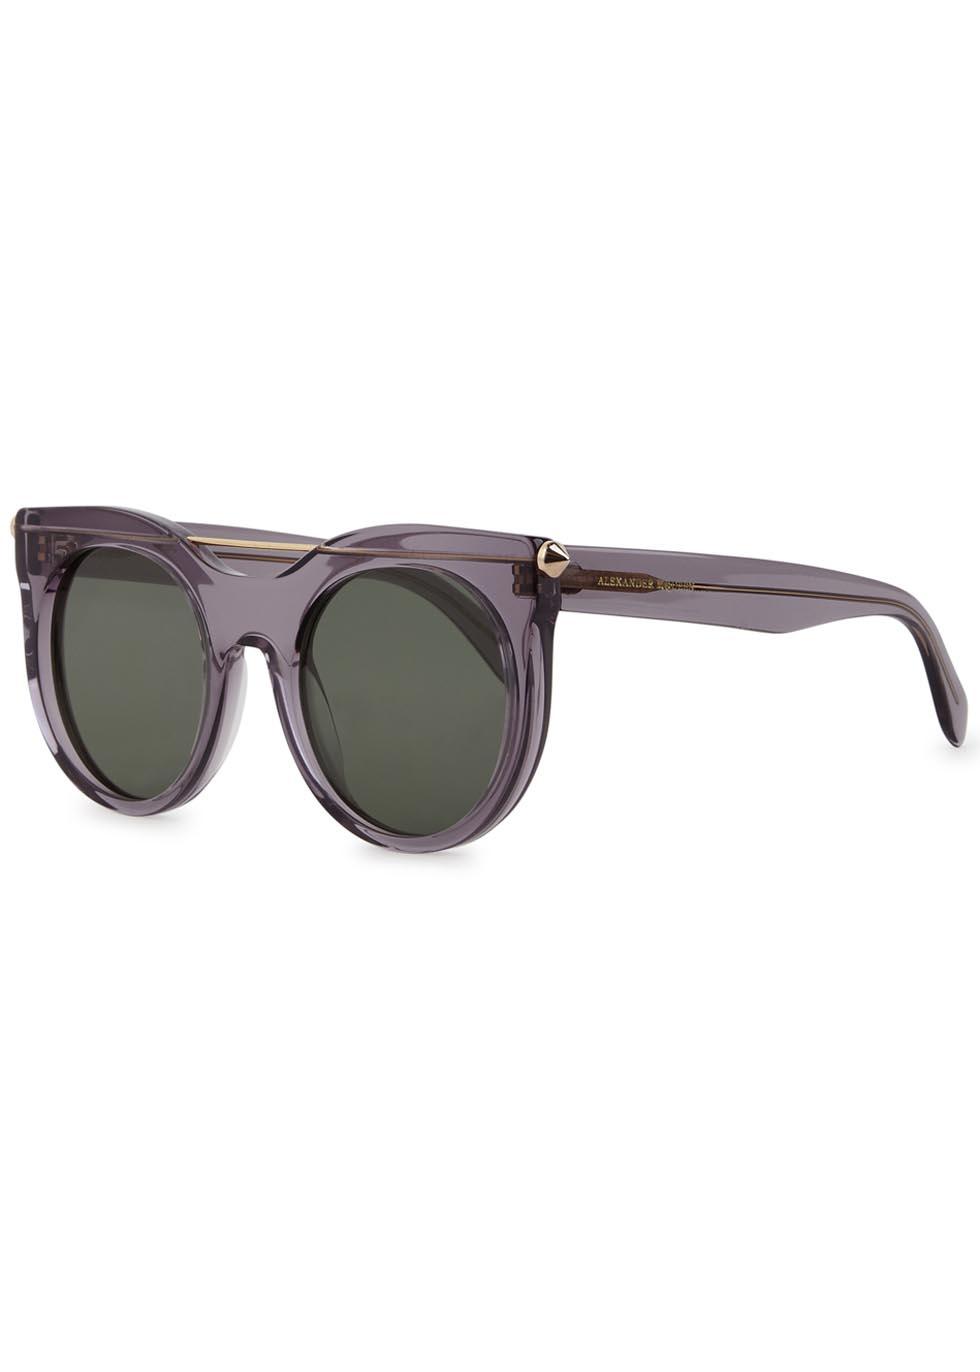 Transparent grey round-frame sunglasses - Alexander McQueen